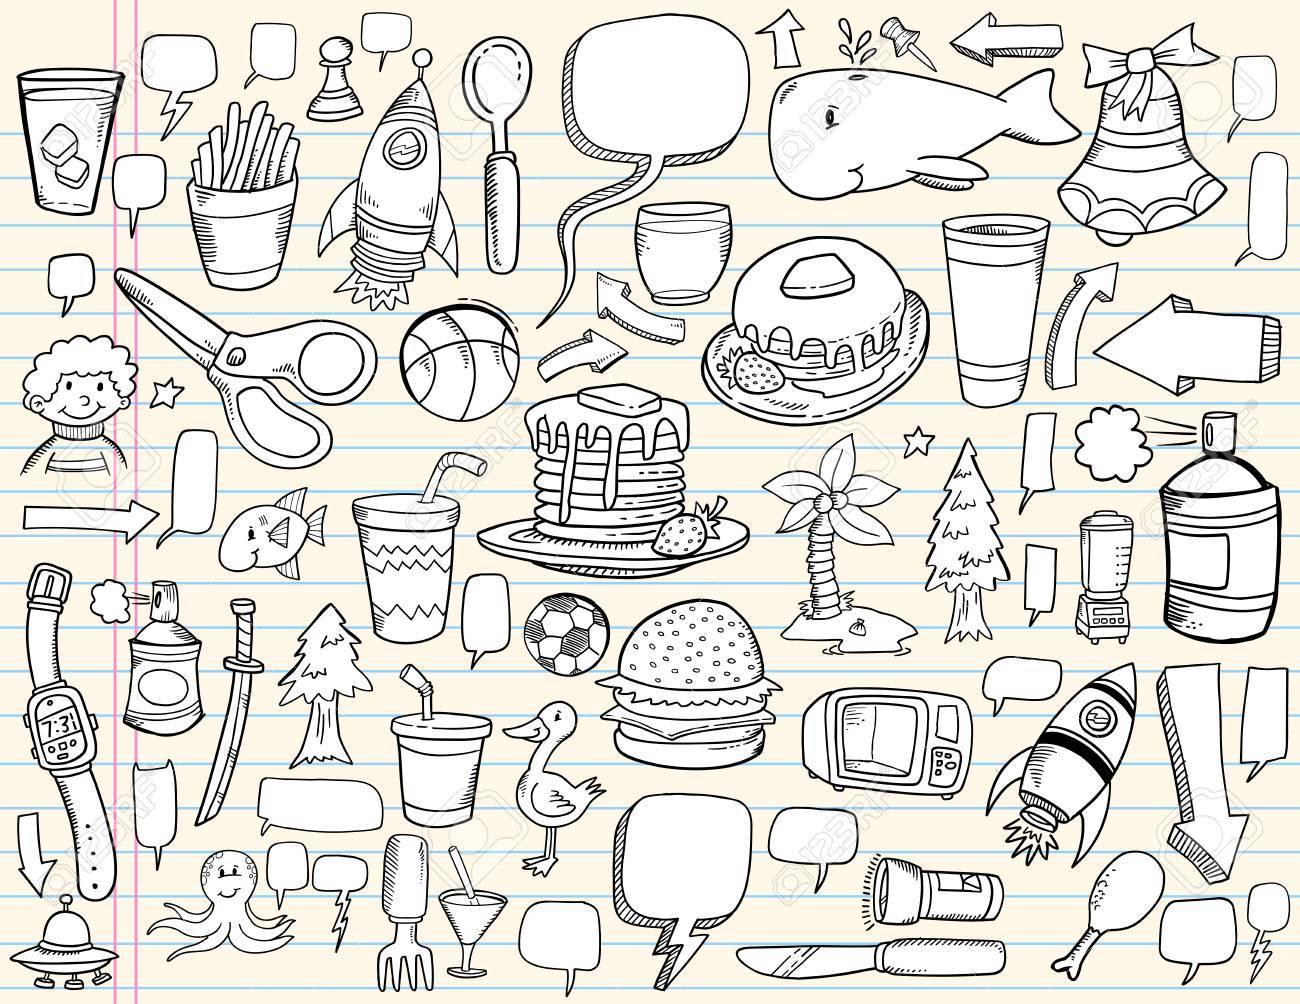 Notebook Doodle Speech Bubble Design Elements Mega Illustration Set - 7261099